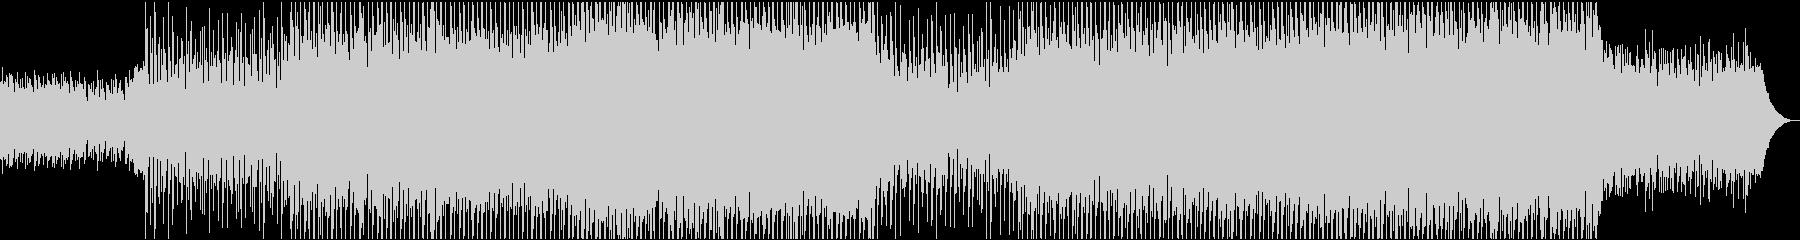 EDMポップで明るいクラブ系-12の未再生の波形